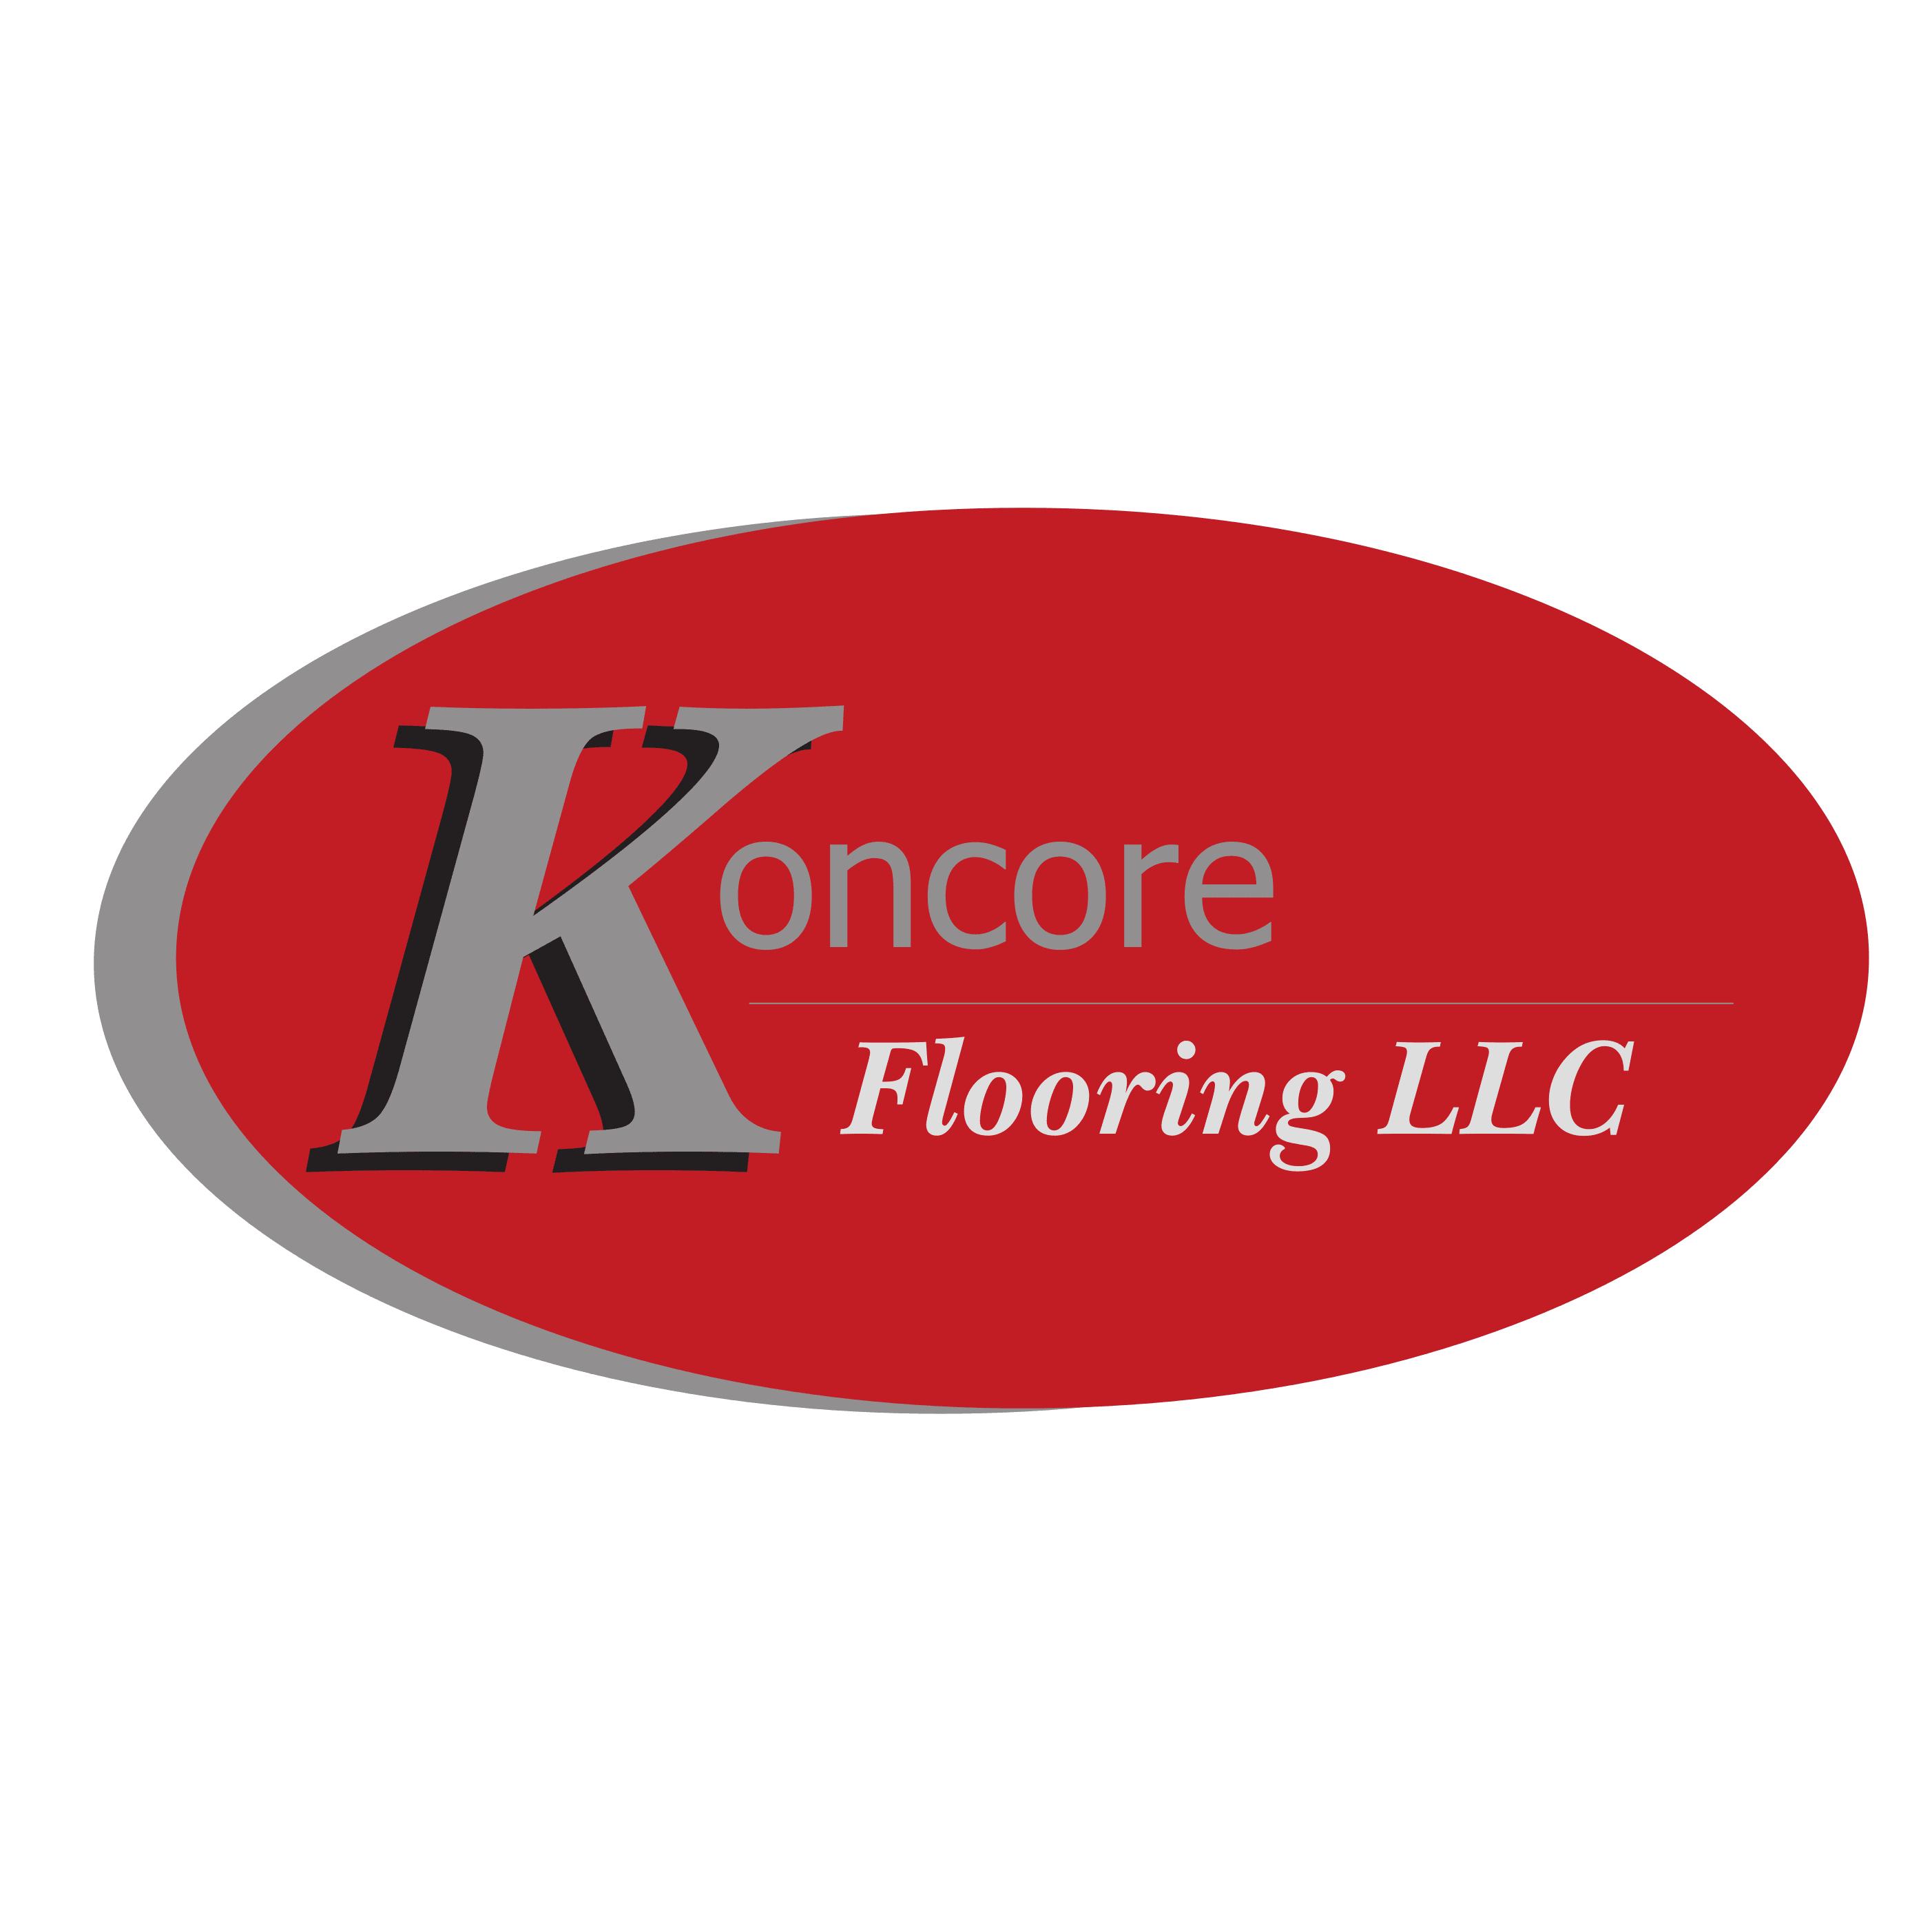 Koncore Flooring LLC